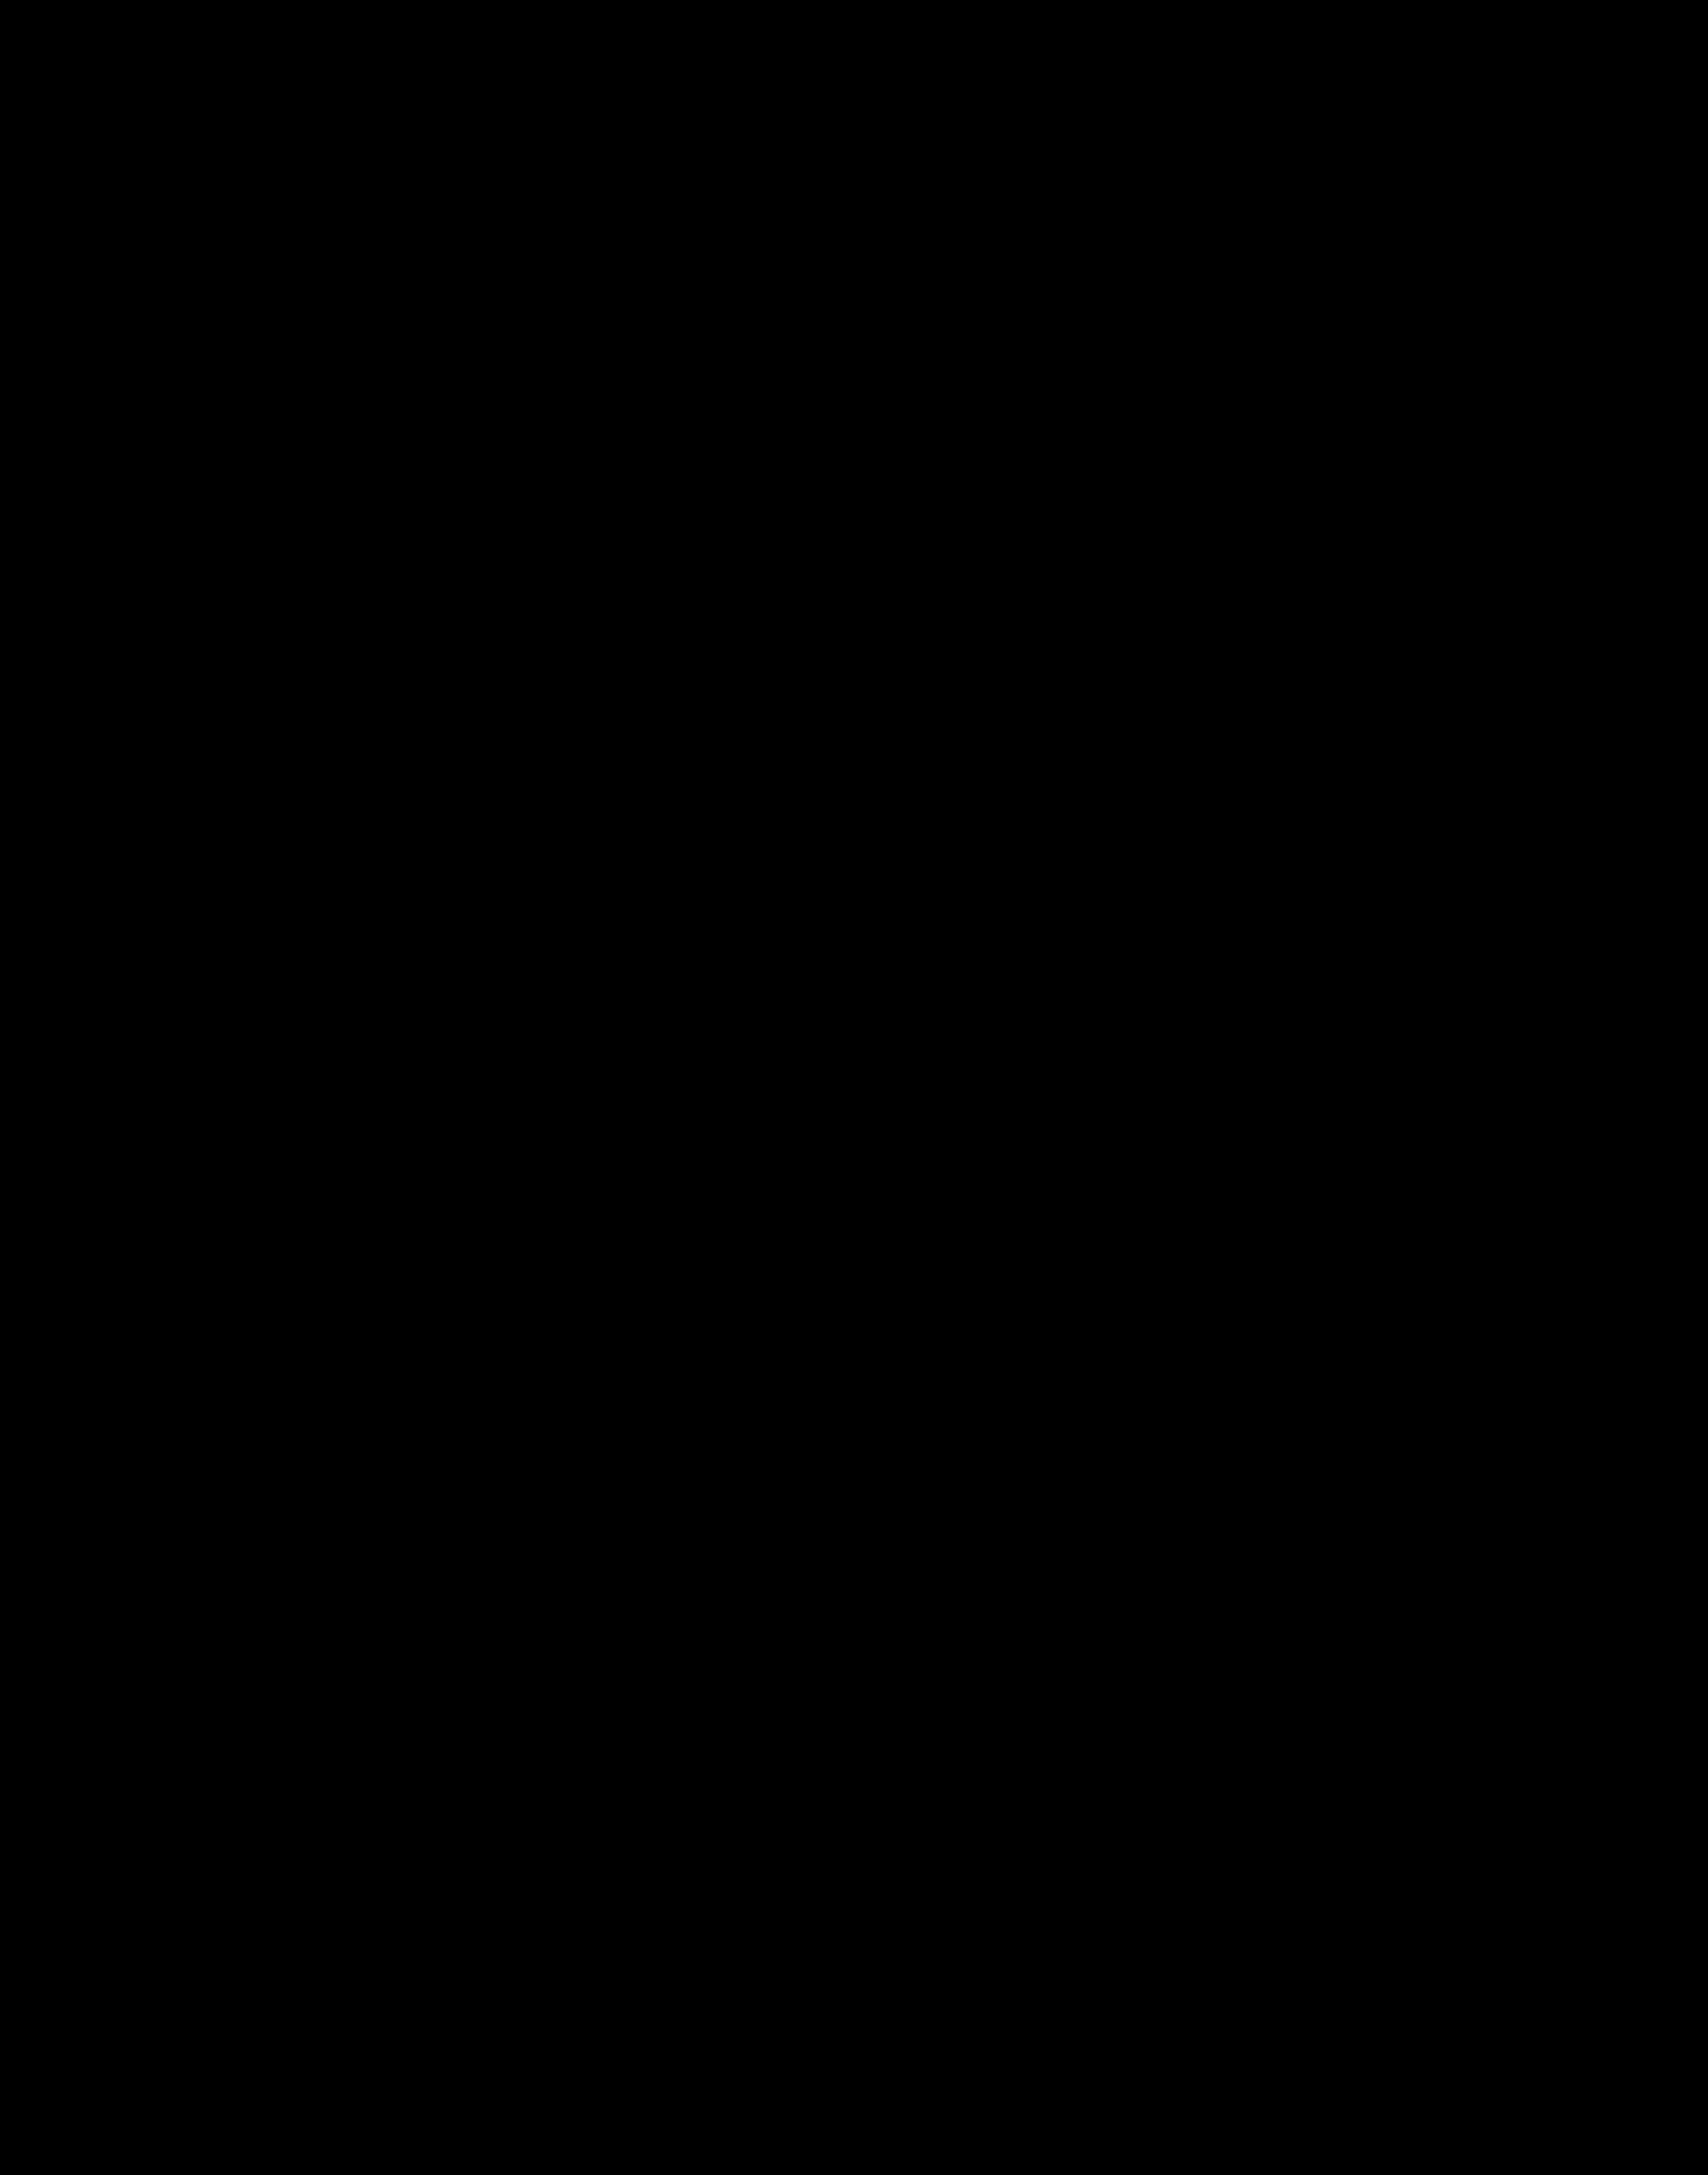 Elektriker-logo-black.png